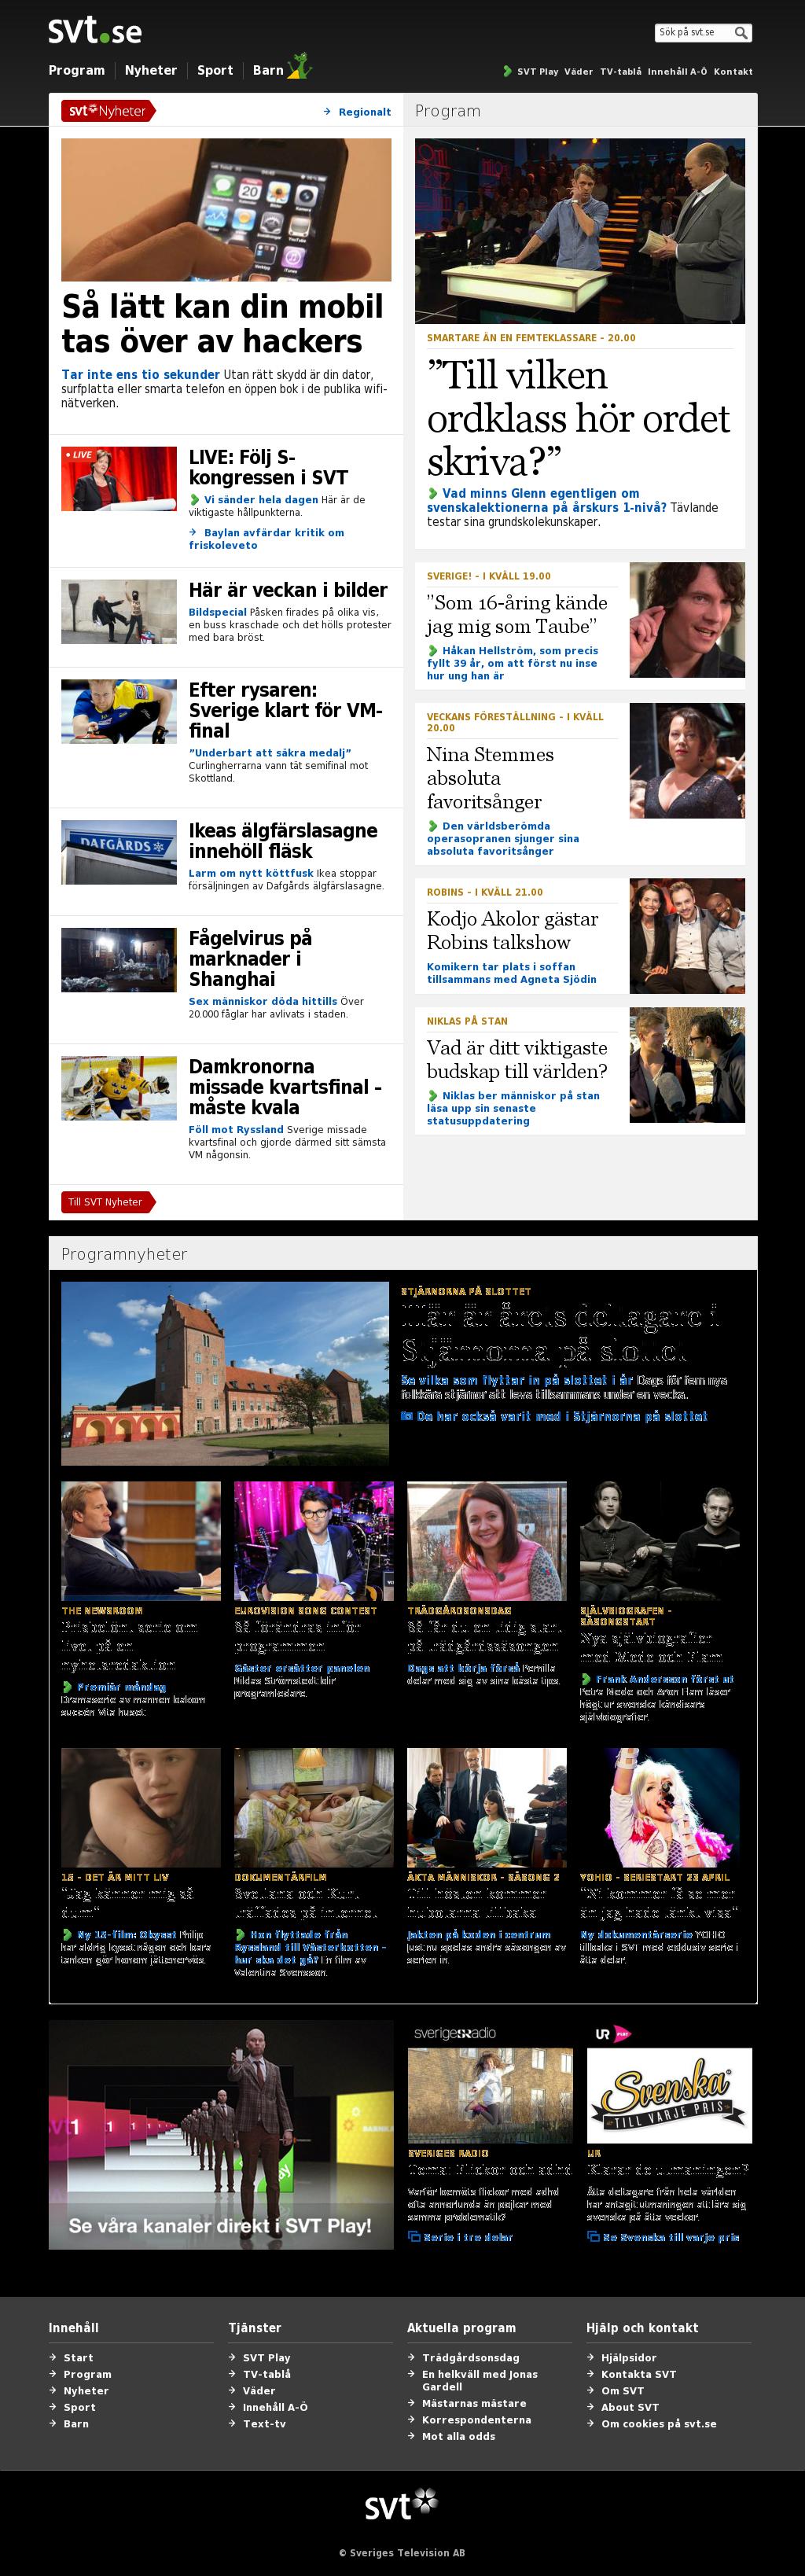 SVT at Saturday April 6, 2013, 10:22 a.m. UTC